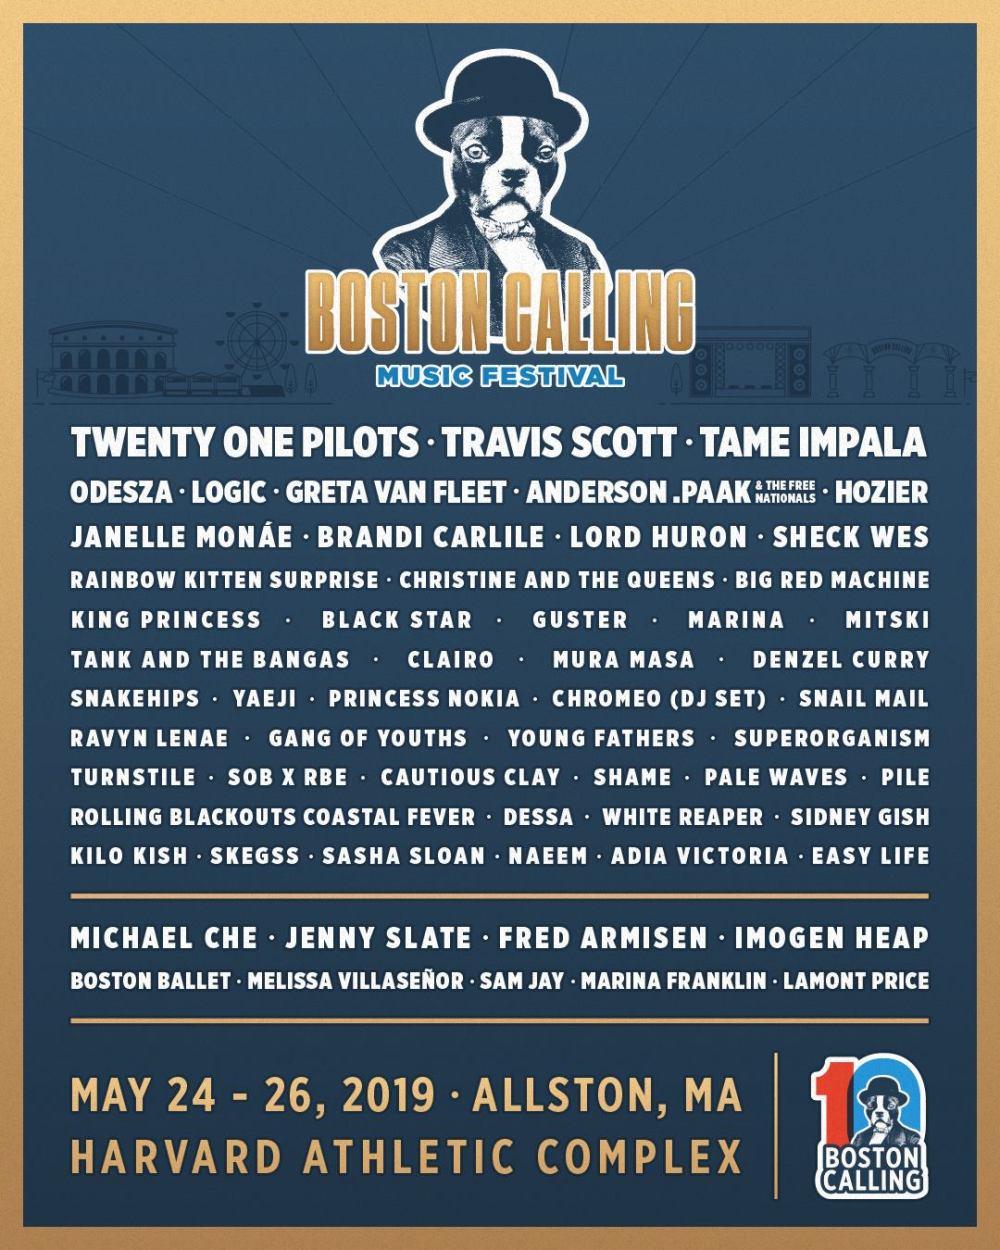 Boston Calling 2019 at Harvard Athletic Complex (Boston) - May 24th, 2019 - poster lineup